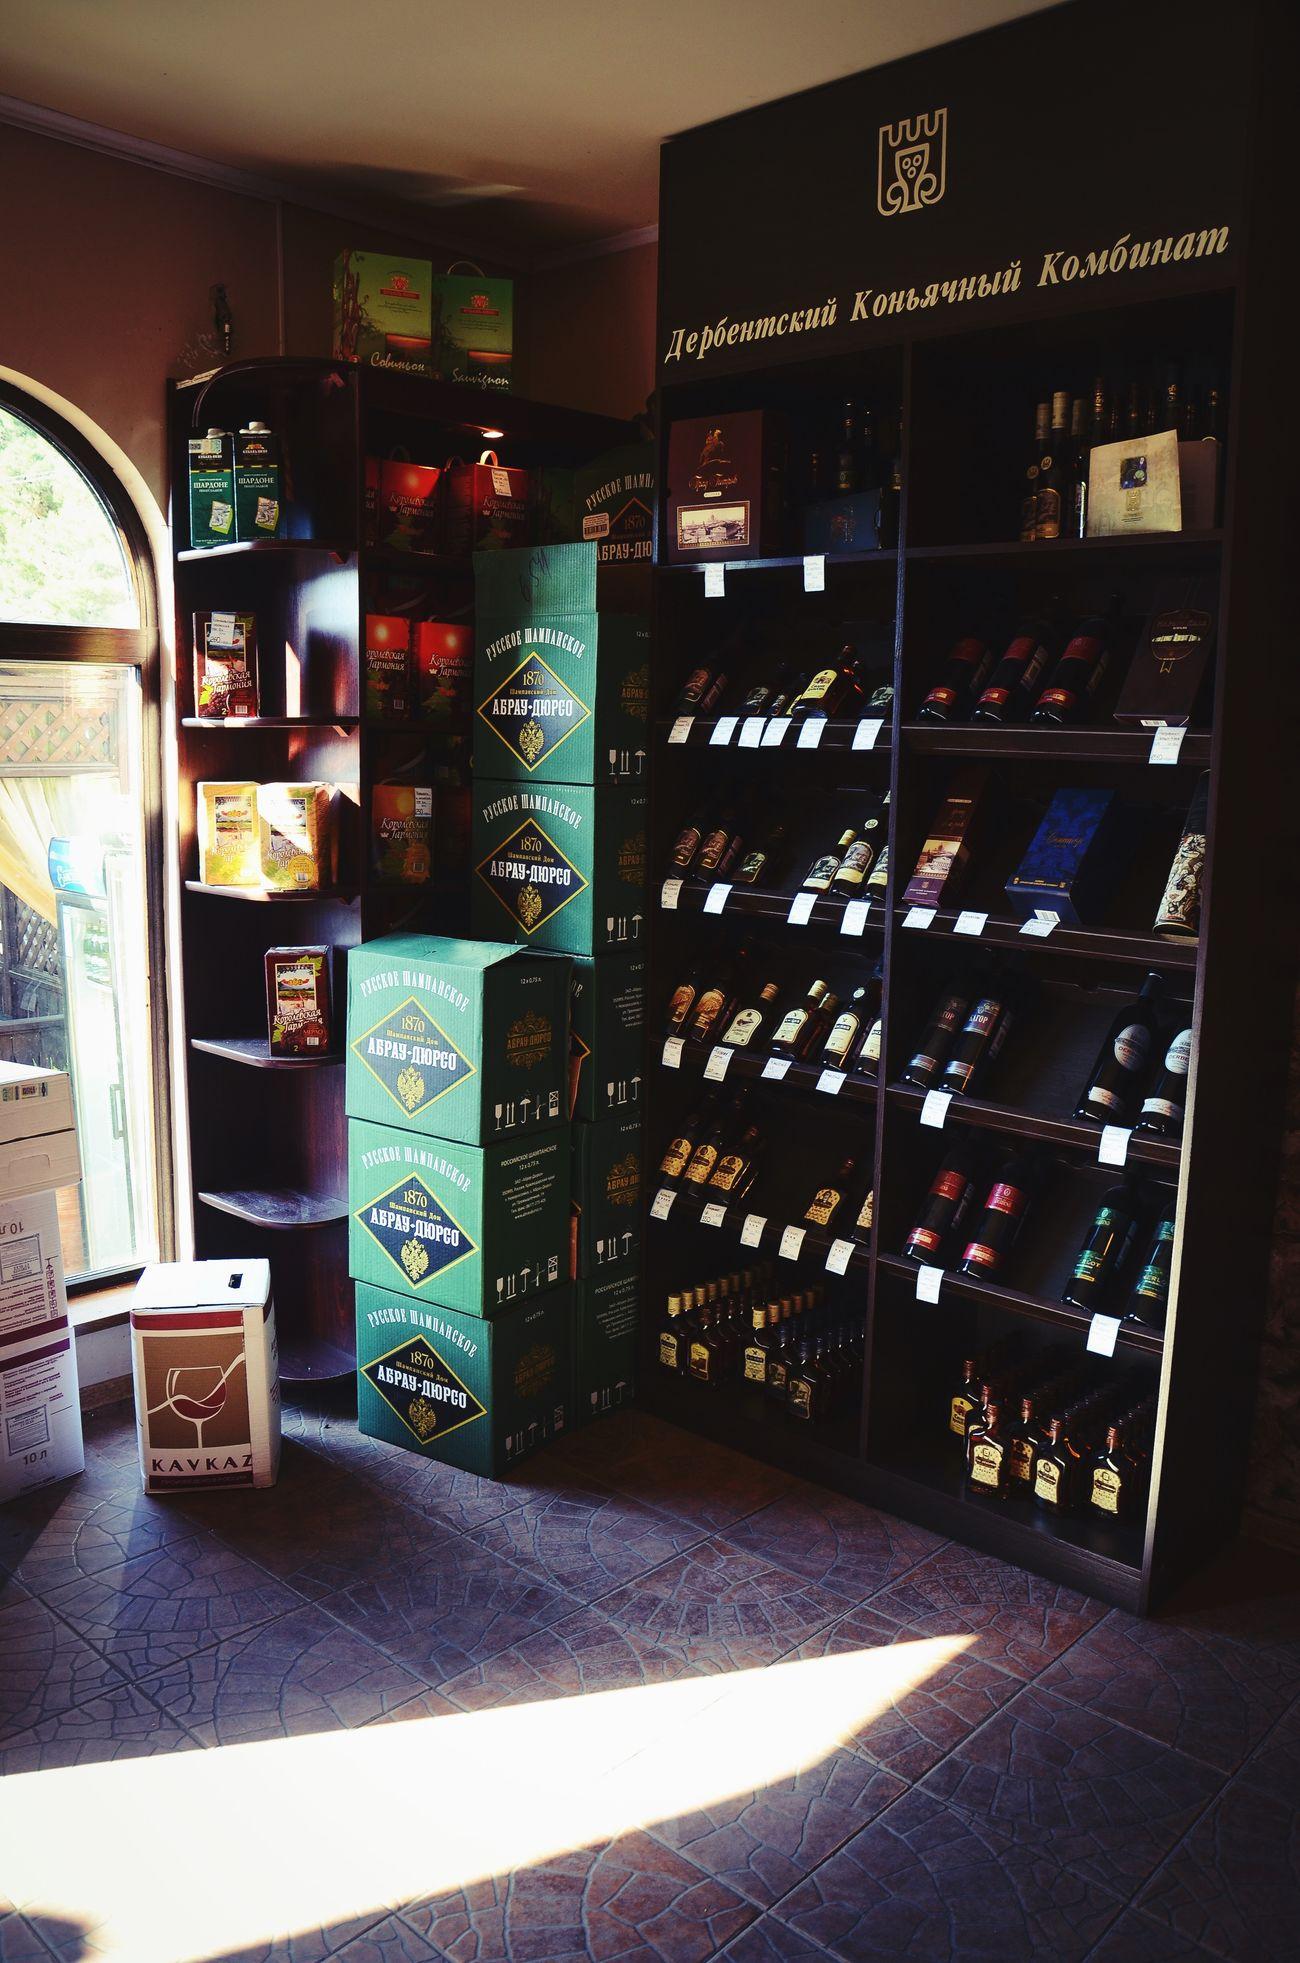 AbrauDurso Vino Wine Champagne